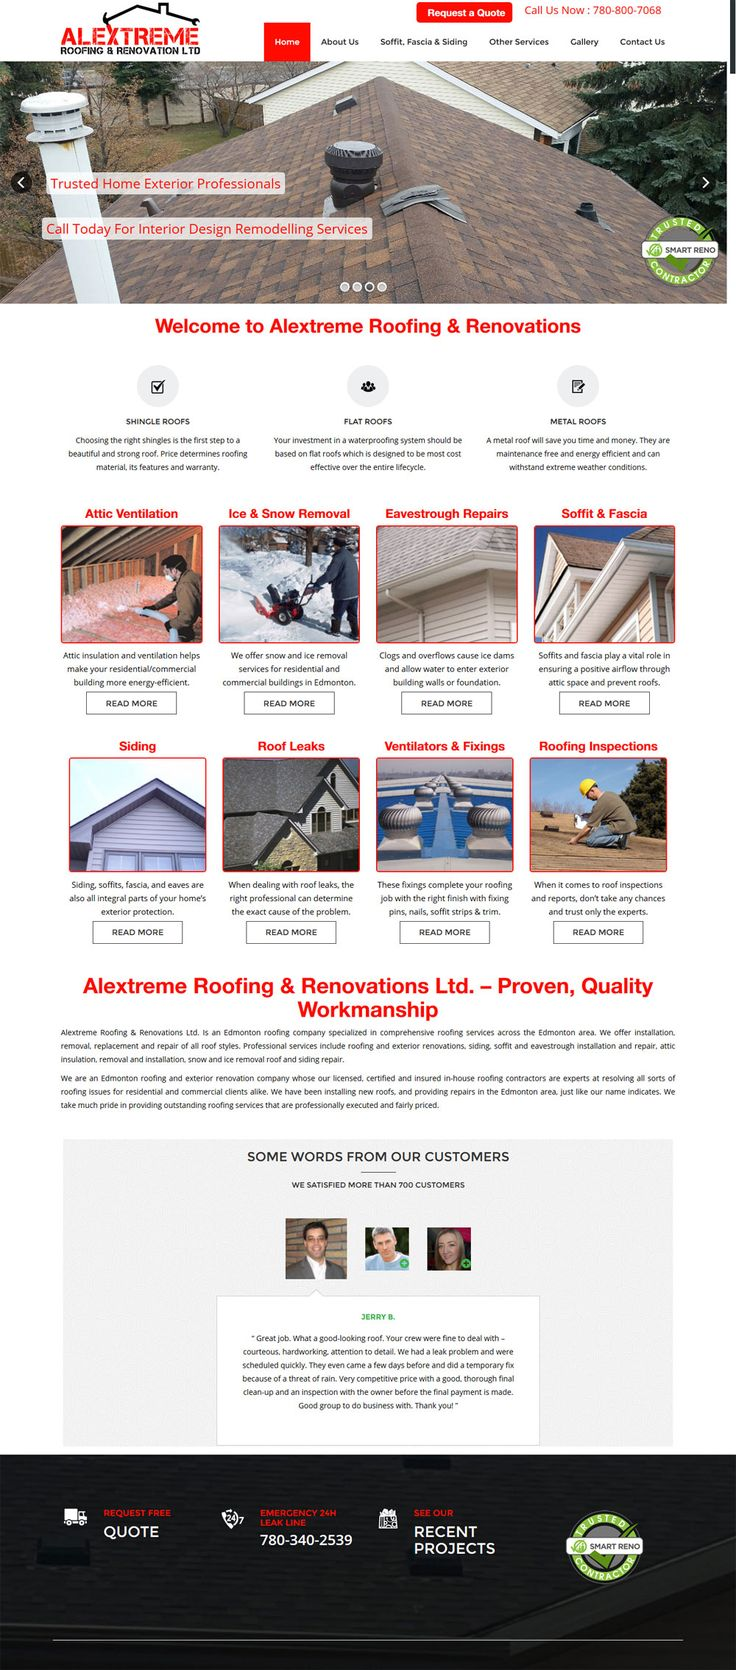 13 best ecommerce website design portfolio images on pinterest find this pin and more on website design portfolio by medialabz